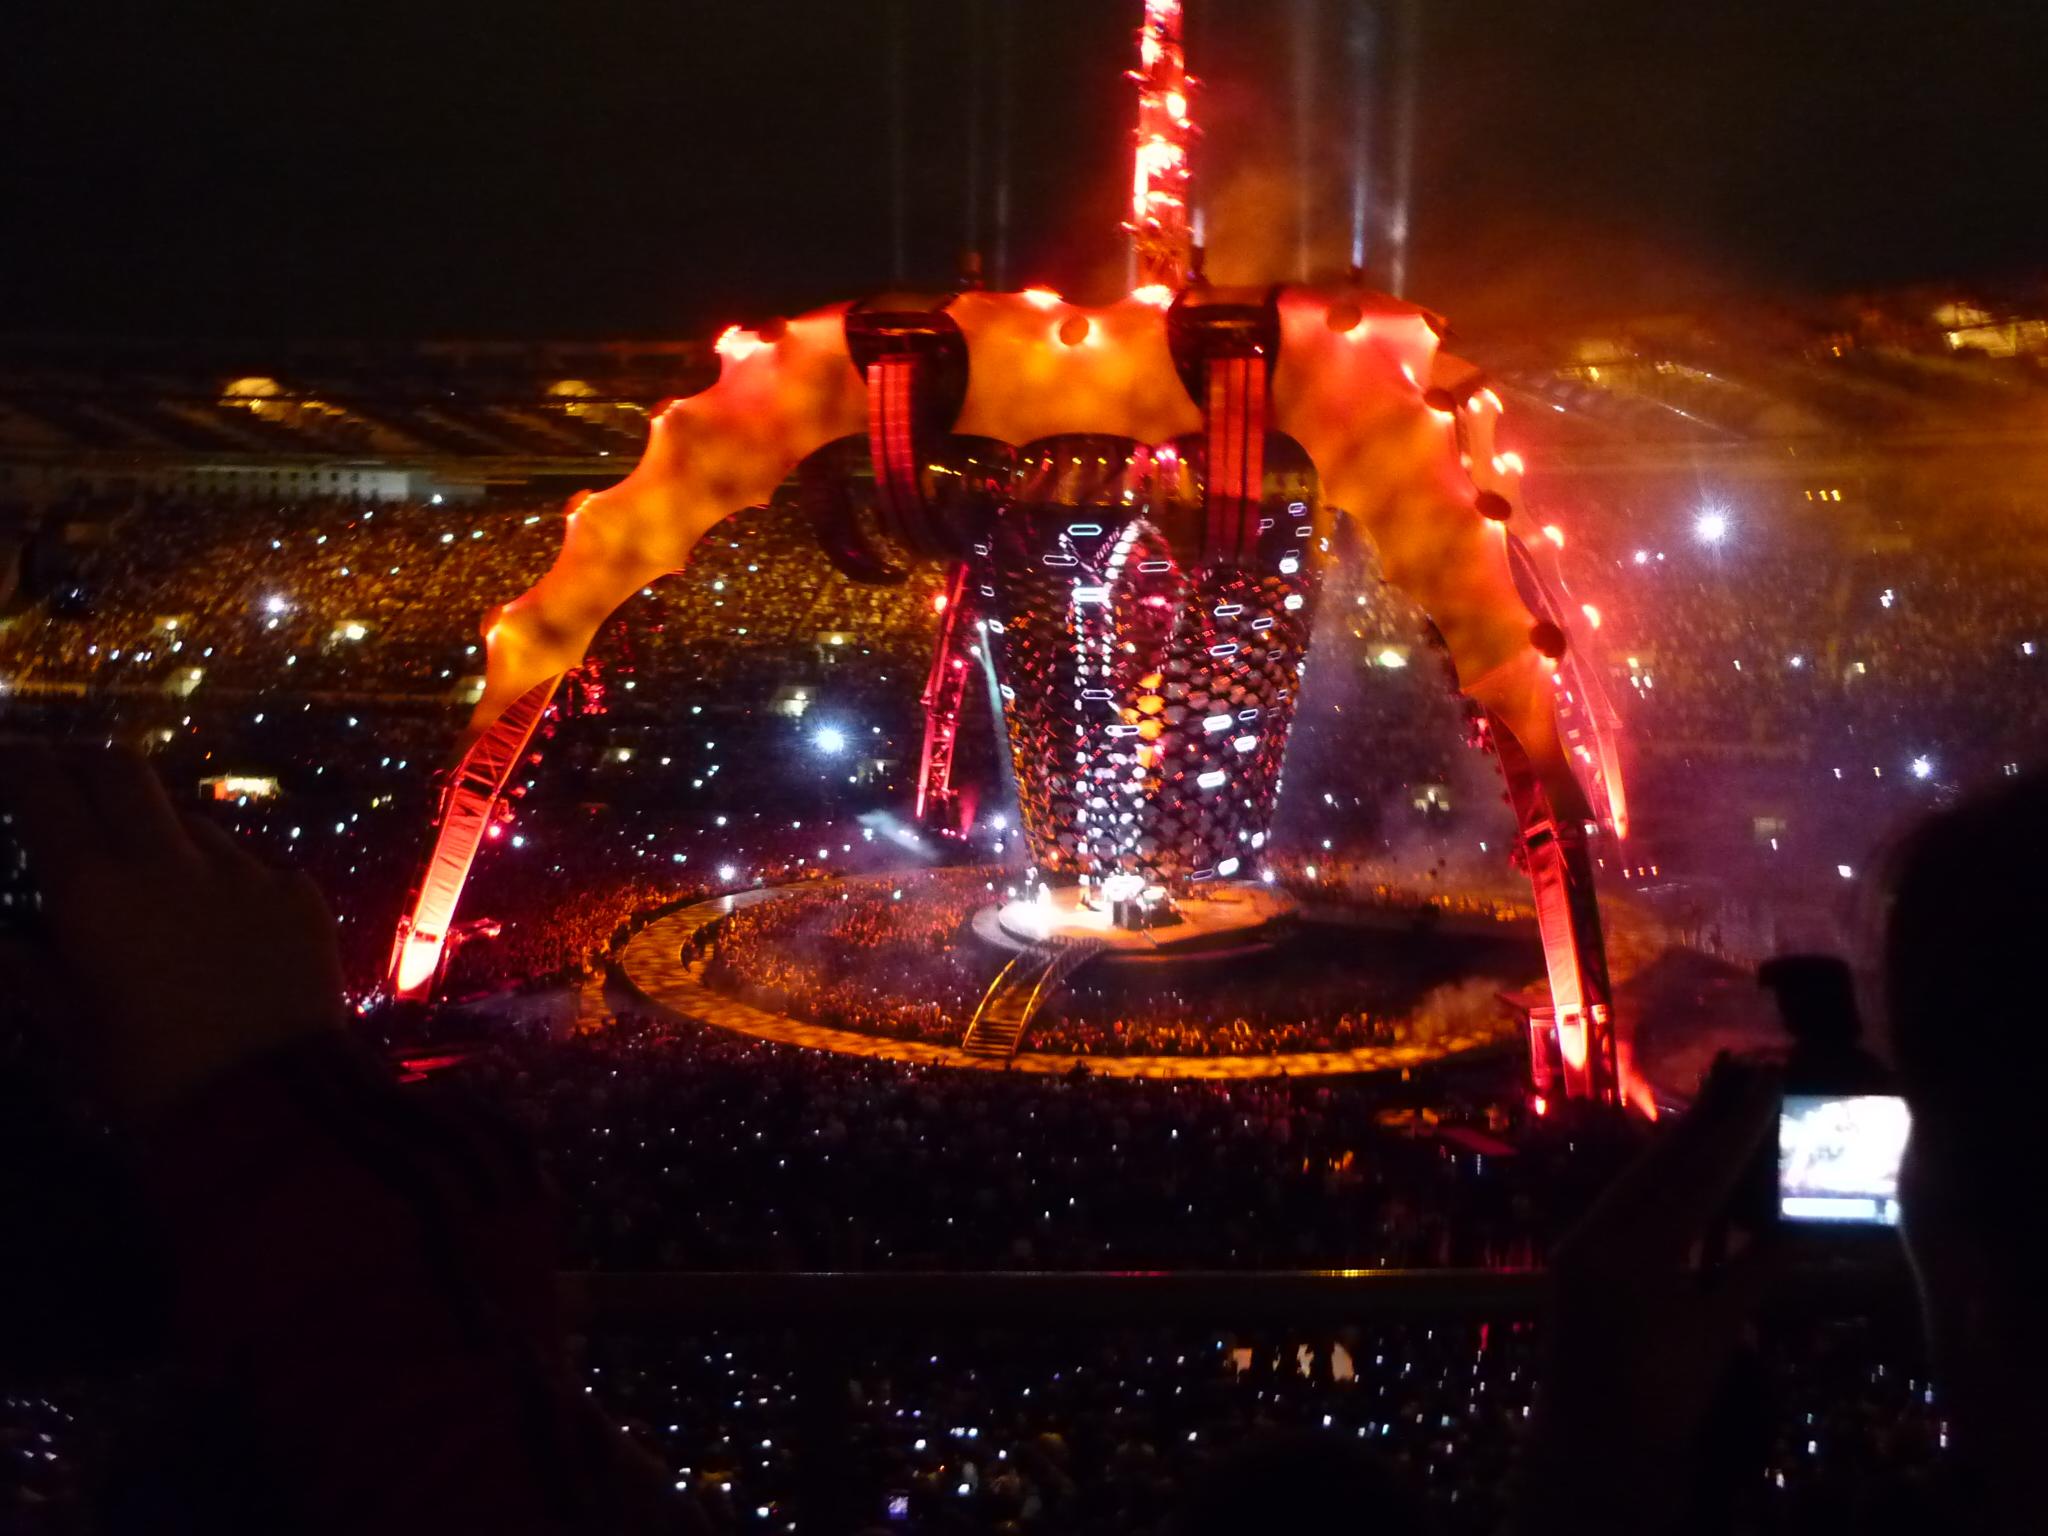 File:2010-10-08 U2 Live at Stadio Olimpico Rome 1.jpg - Wikimedia ...